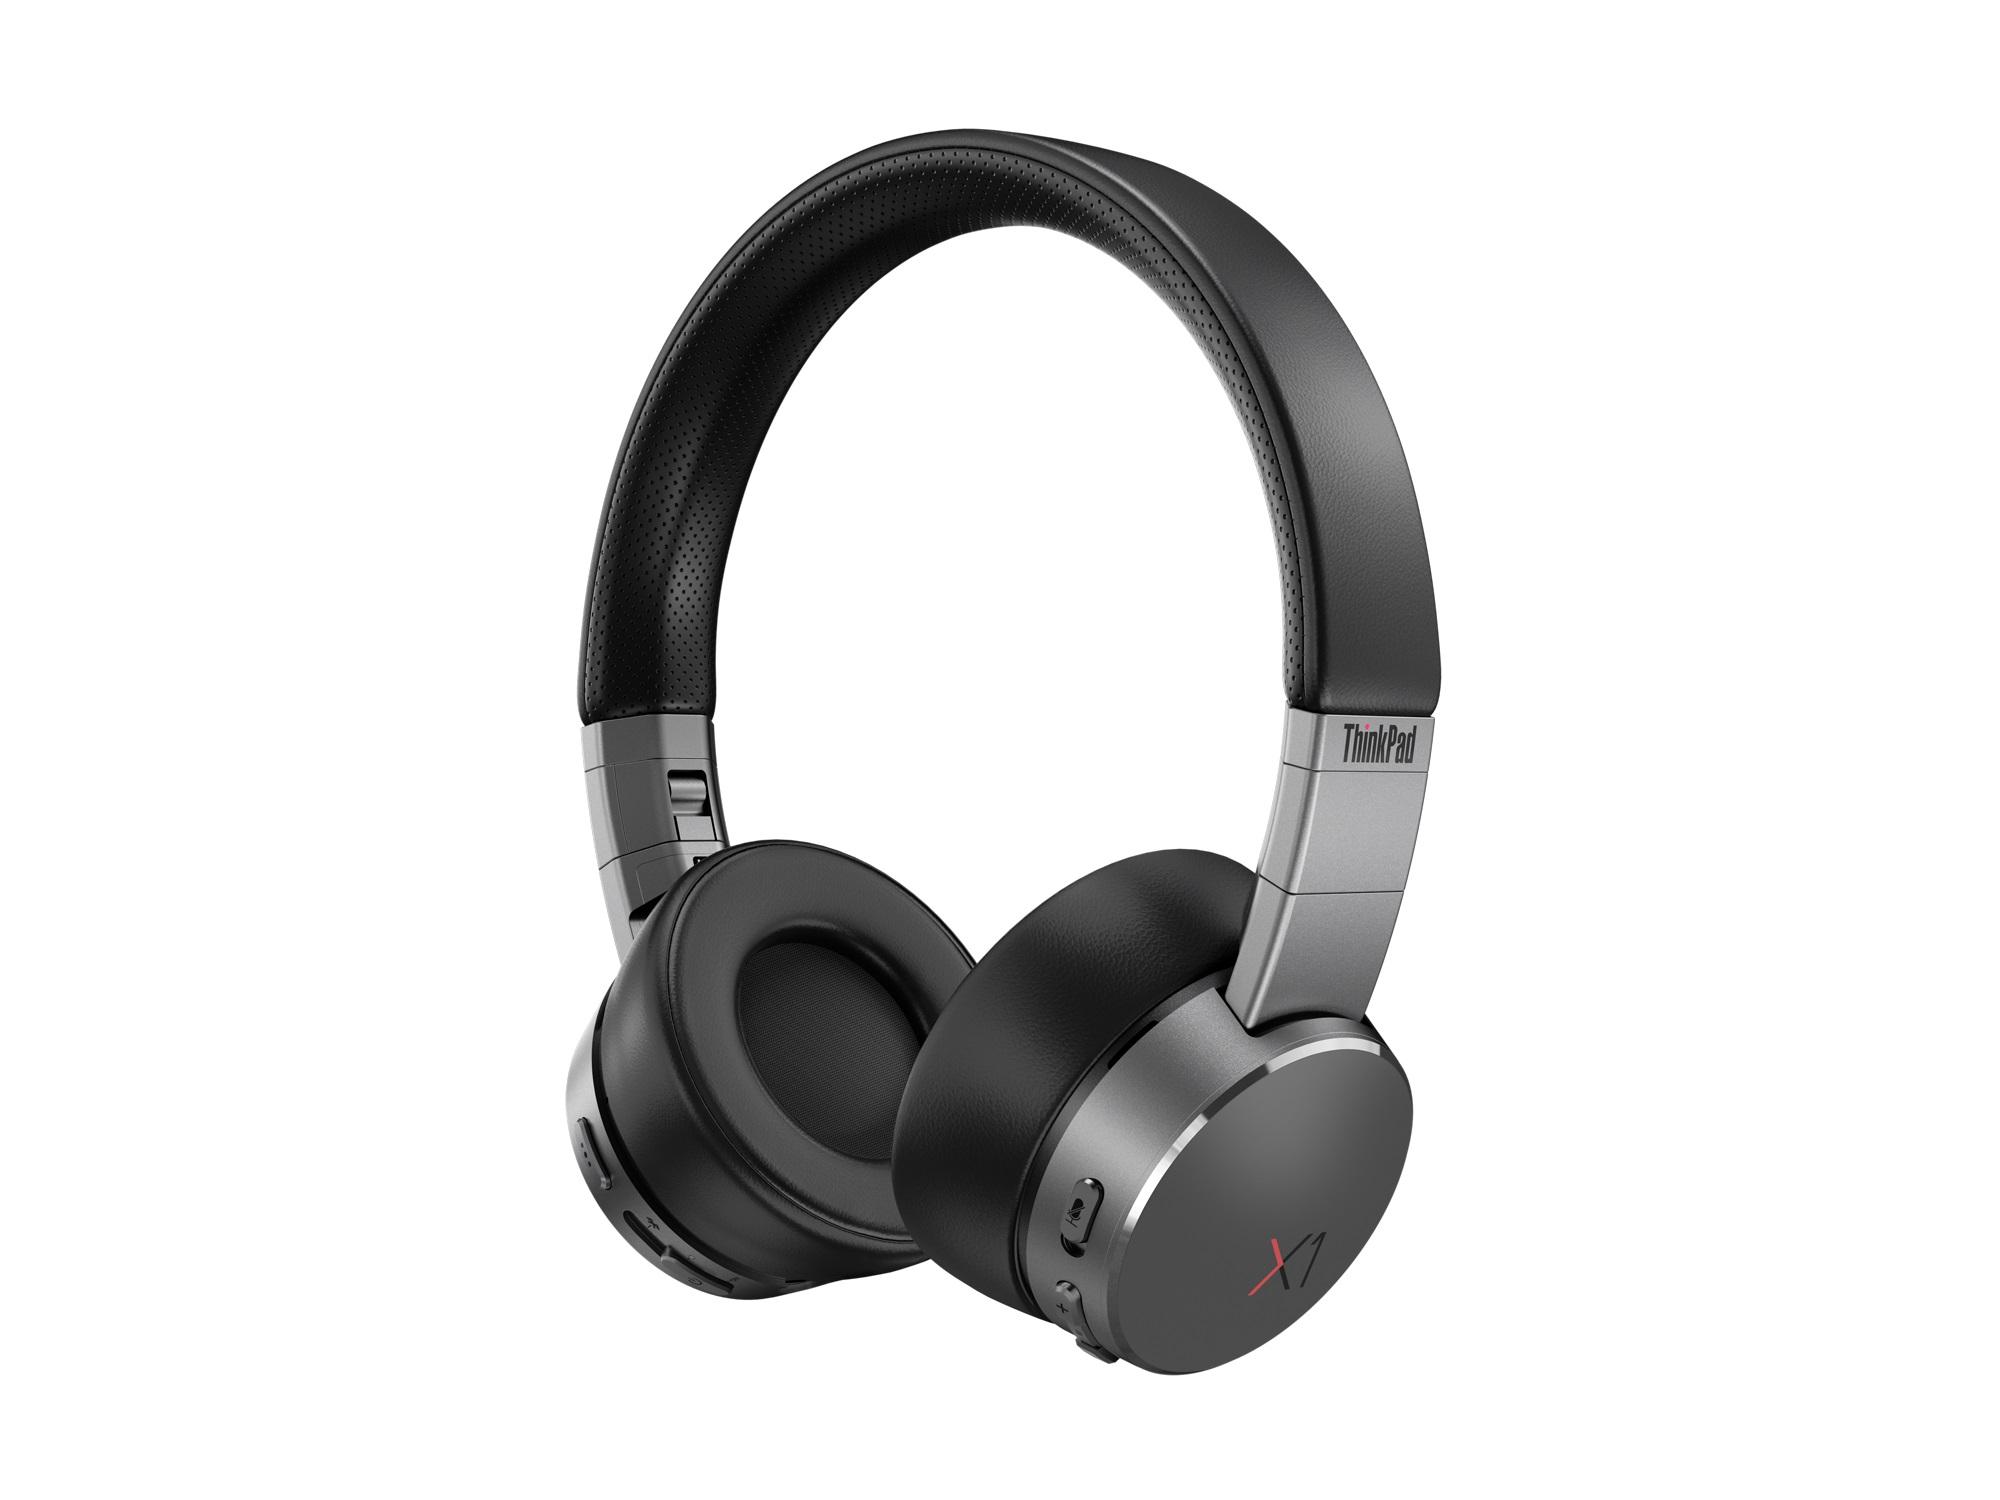 ThinkPad X1 Active Noise Cancellation Headphone